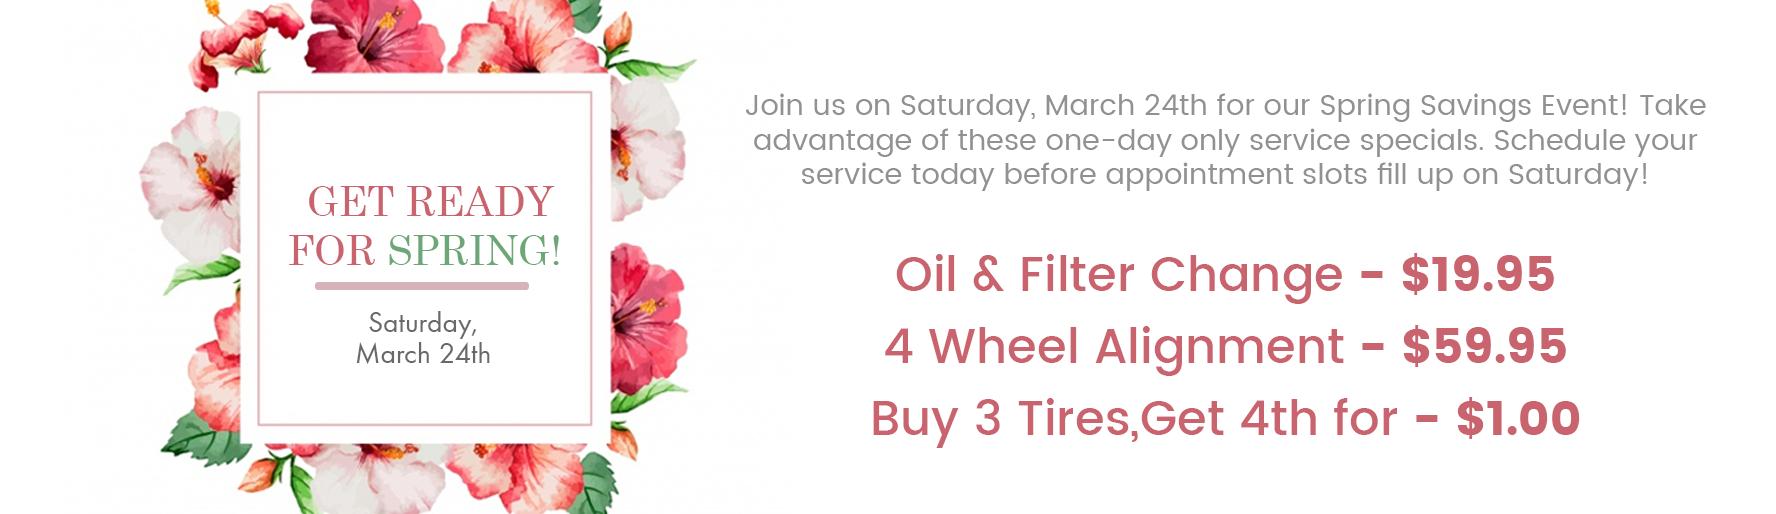 March-24th-Service-Event